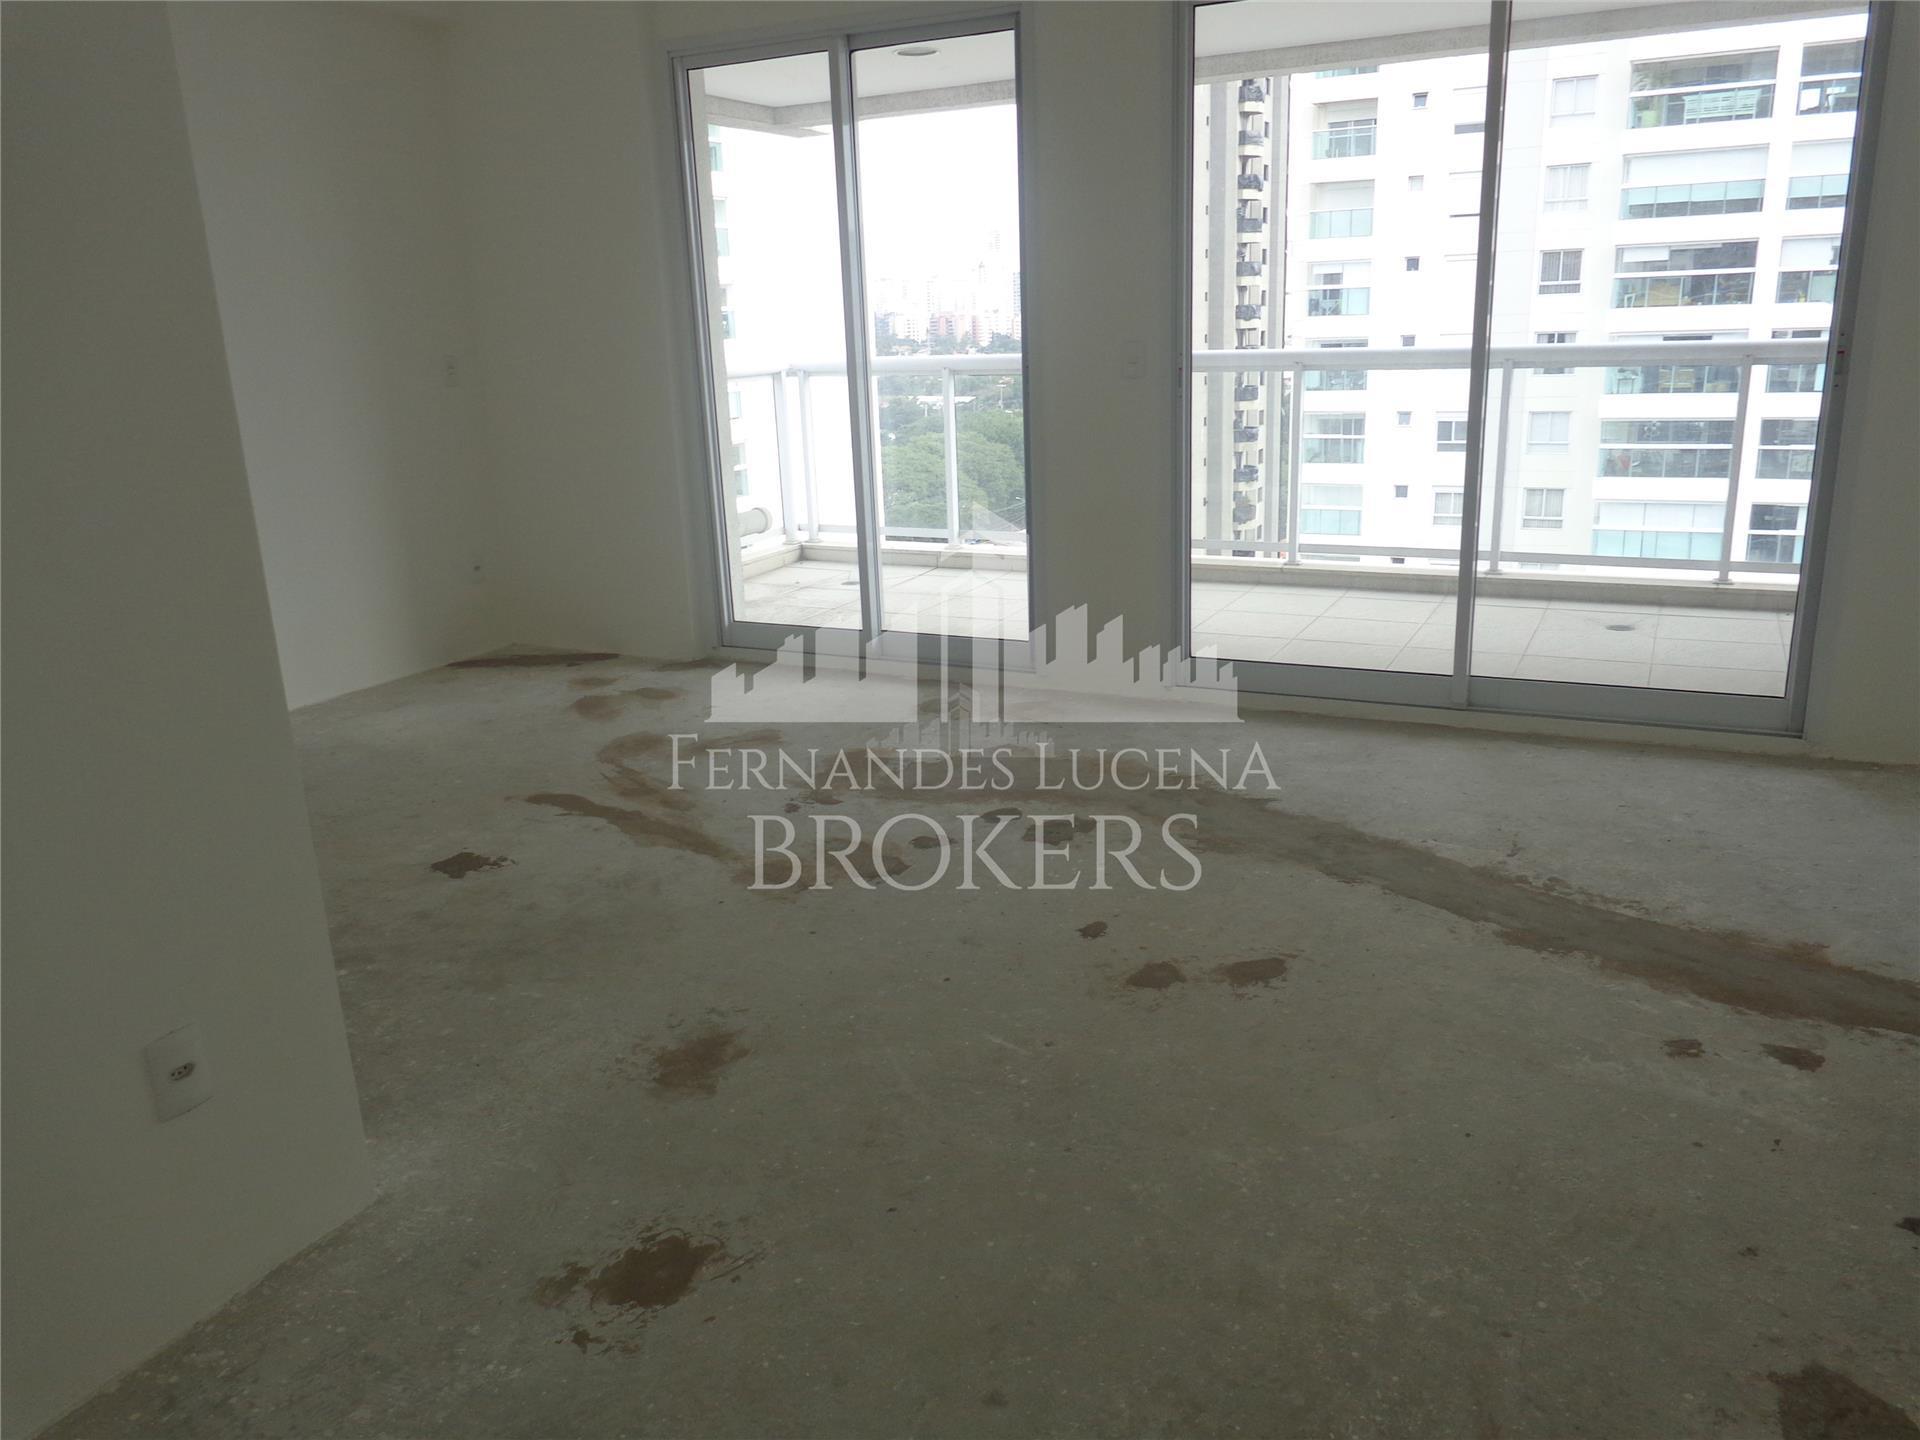 apartamento com 43m², 1 suíte, 1 vaga na vila olimpia -nunca habitado - contrapiso, andar alto,...